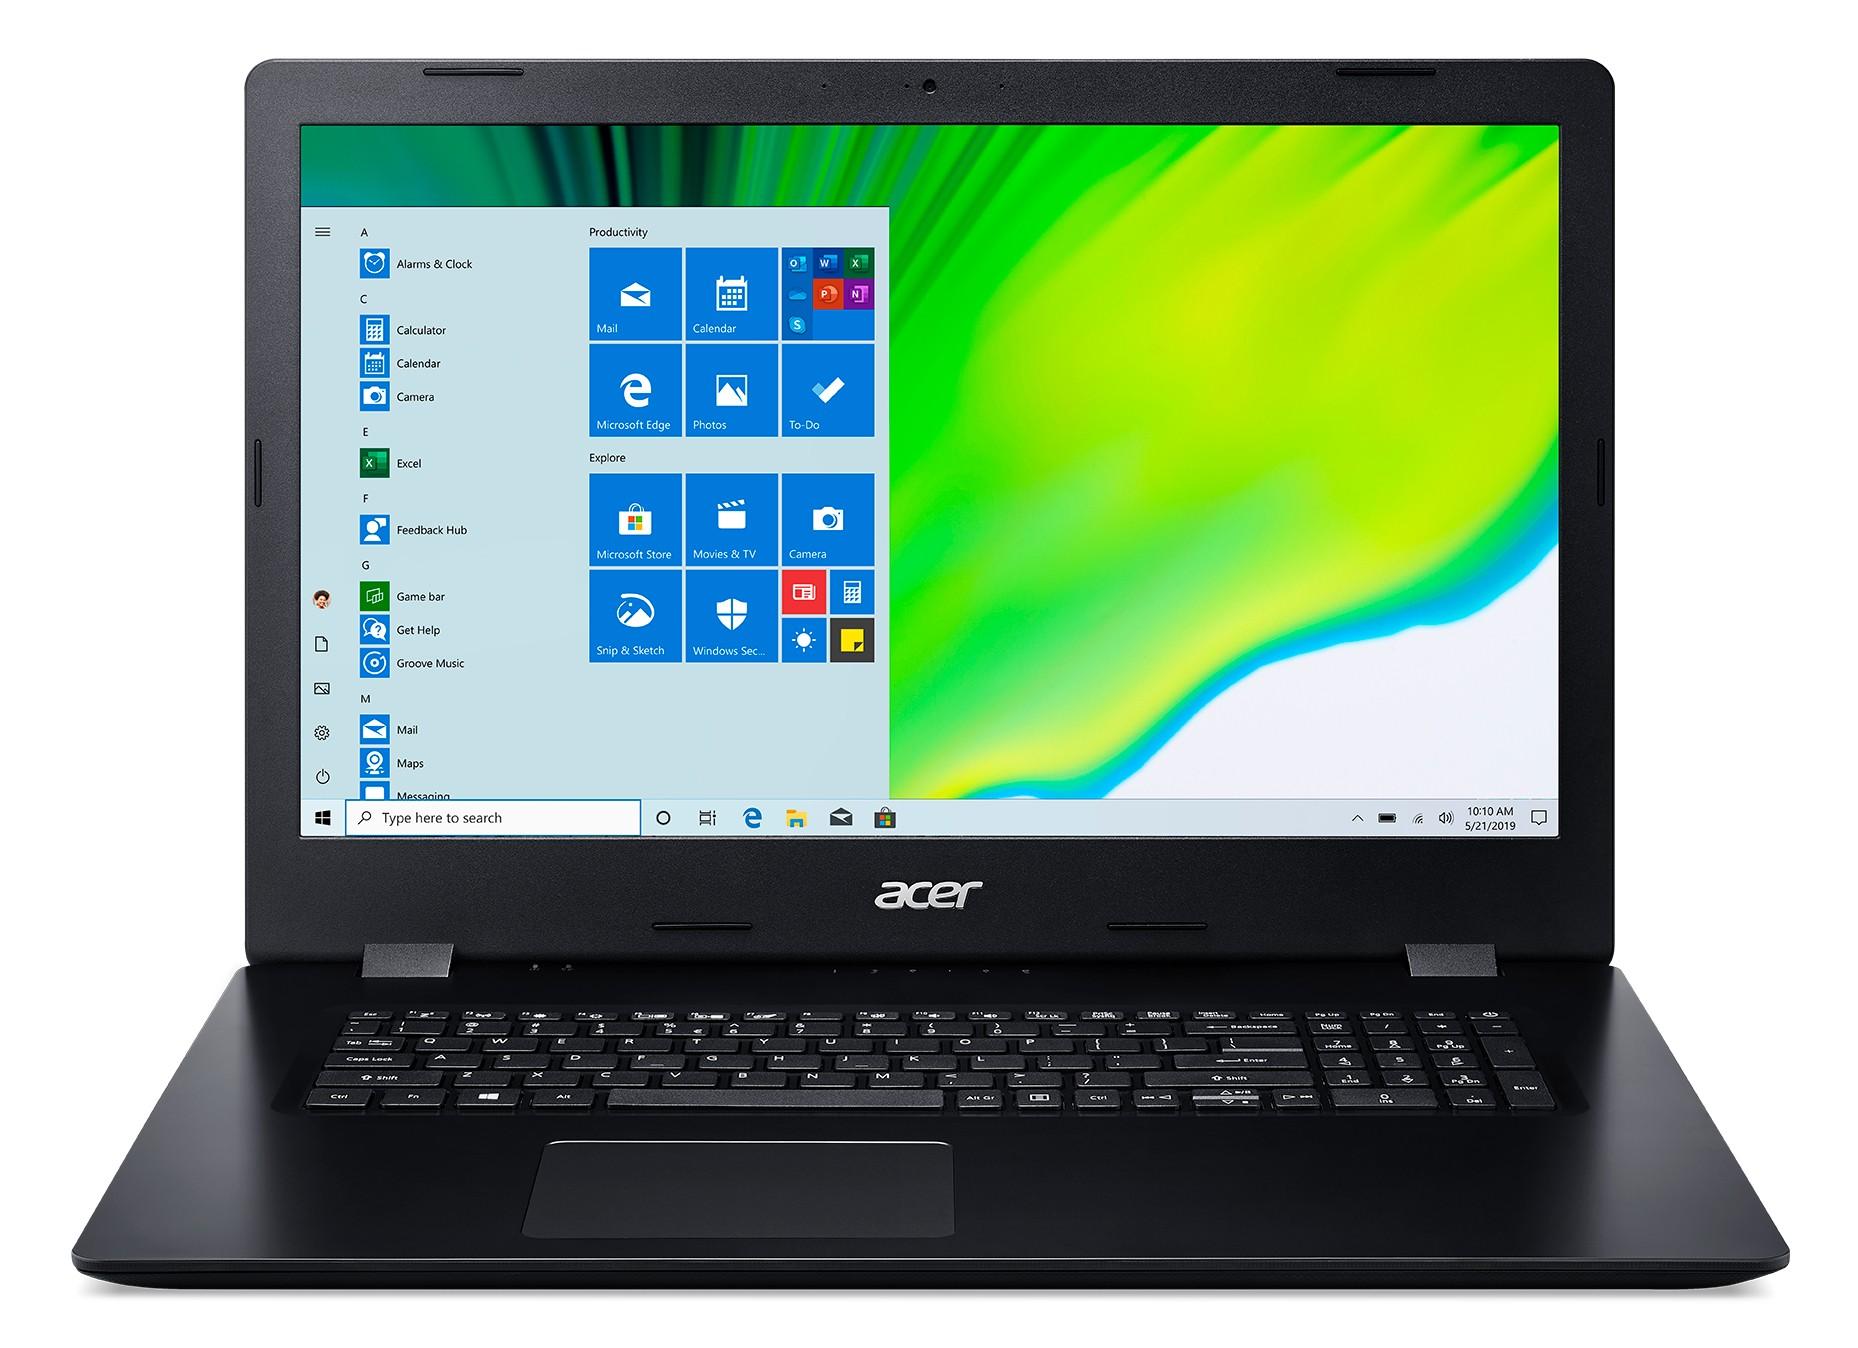 "Acer Aspire 3 A317-52-31ZH Notebook 43,9 cm (17.3"") 1600 x 900 Pixels Intel® 10de generatie Core™ i3 8 GB DDR4-SDRAM 256 GB SSD Wi-Fi 5 (802.11ac) Windows 10 Home Zwart"